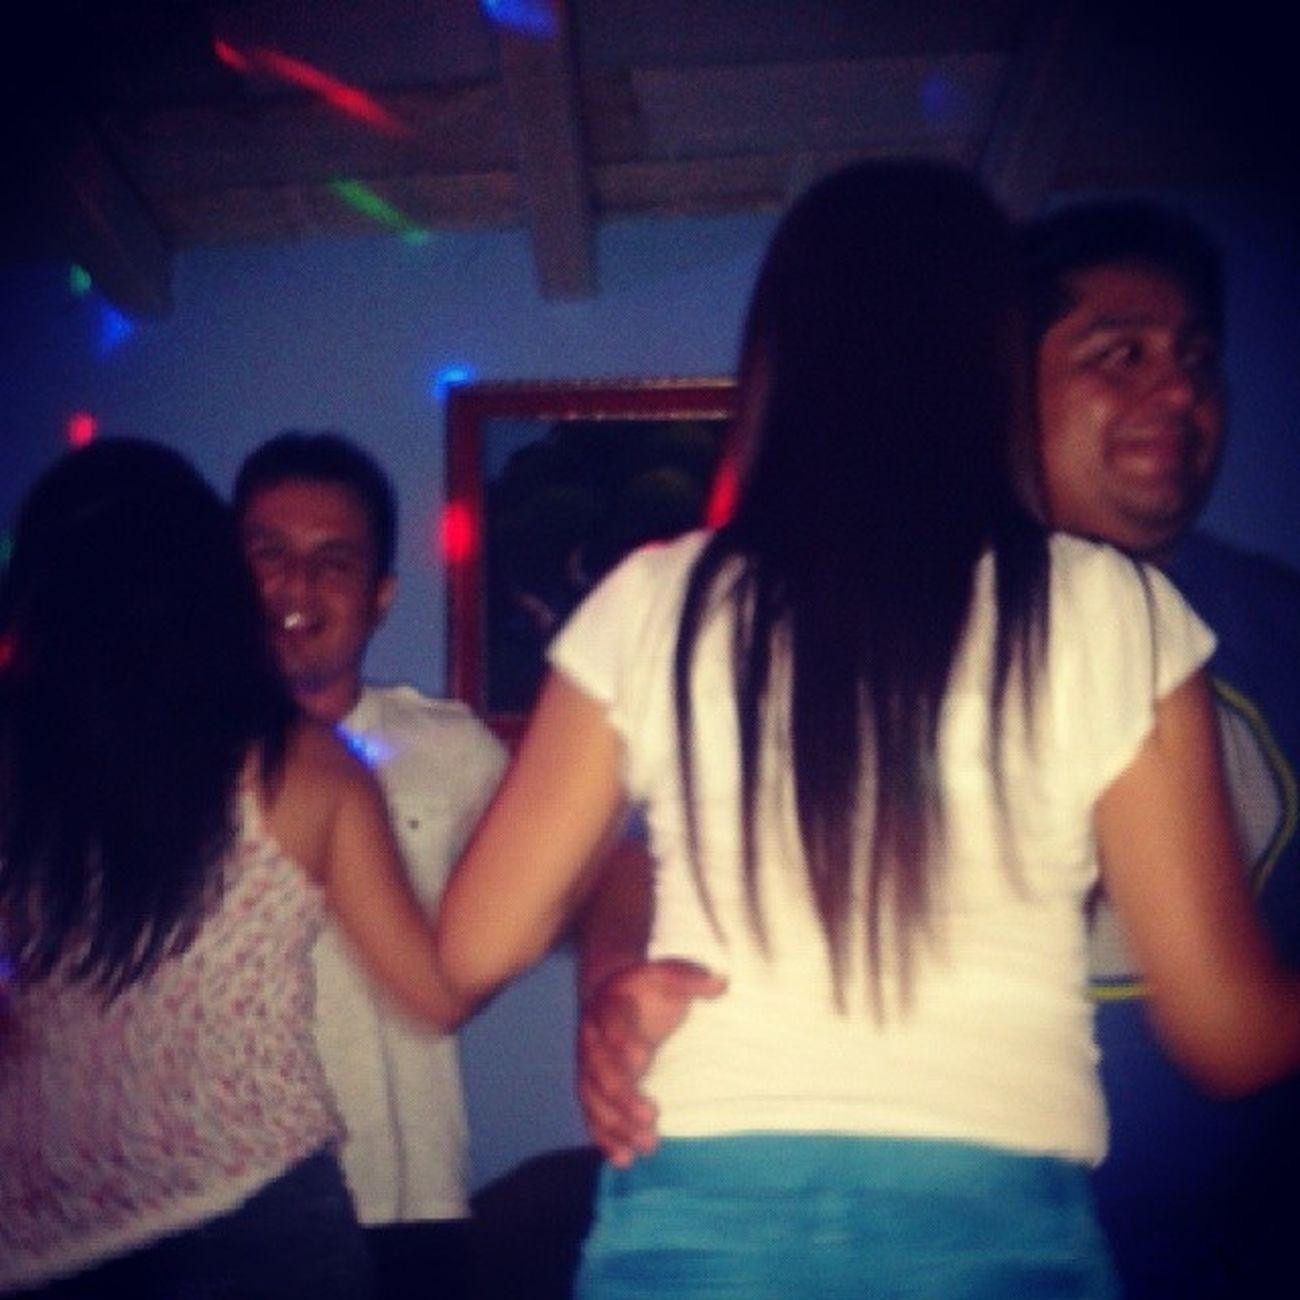 Baile ... noche de salsa Igersperu Salsa Friends Moments time